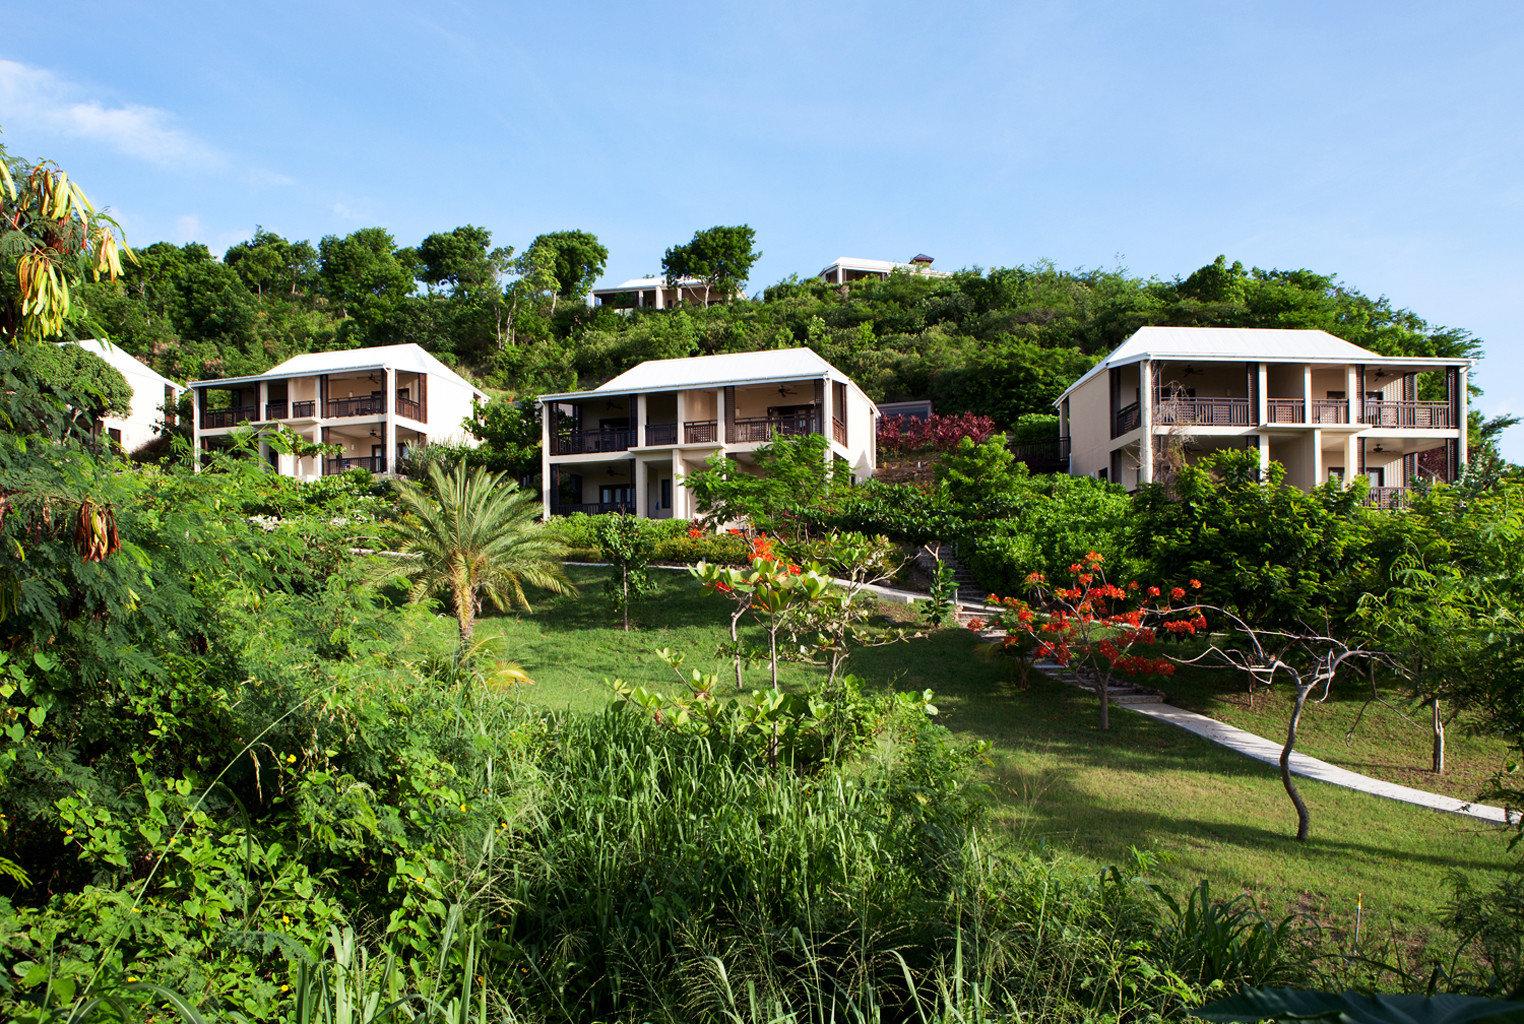 grass sky property house building residential area home Resort backyard Garden cottage yard lawn plantation flower trailer